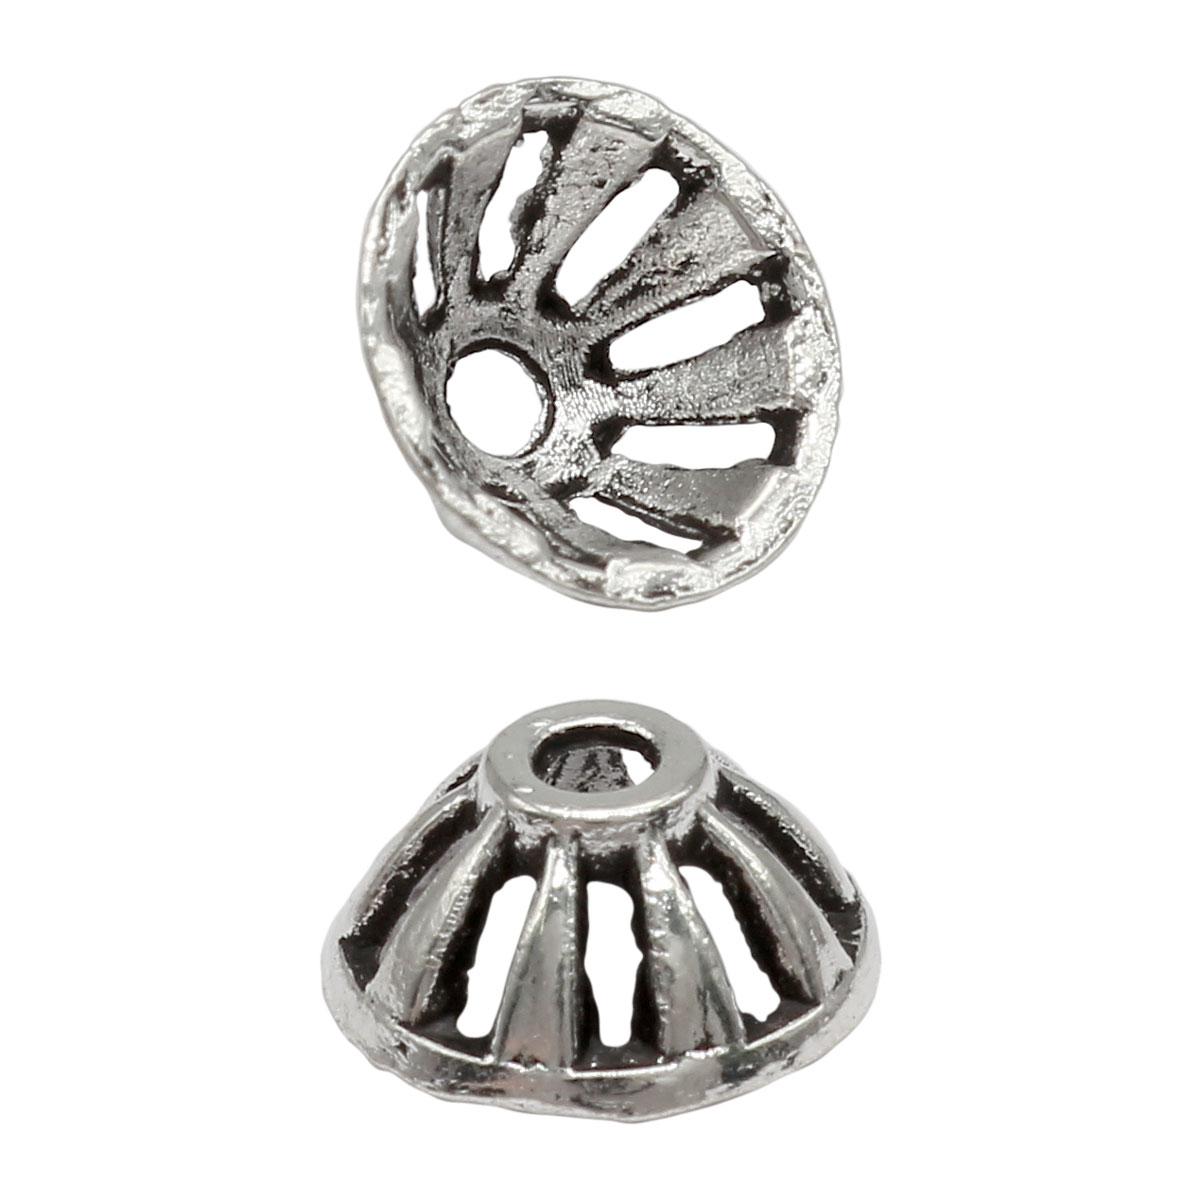 Шапочка для бусин 4AR287, 9,5мм, серебро, 10шт/упак, Астра